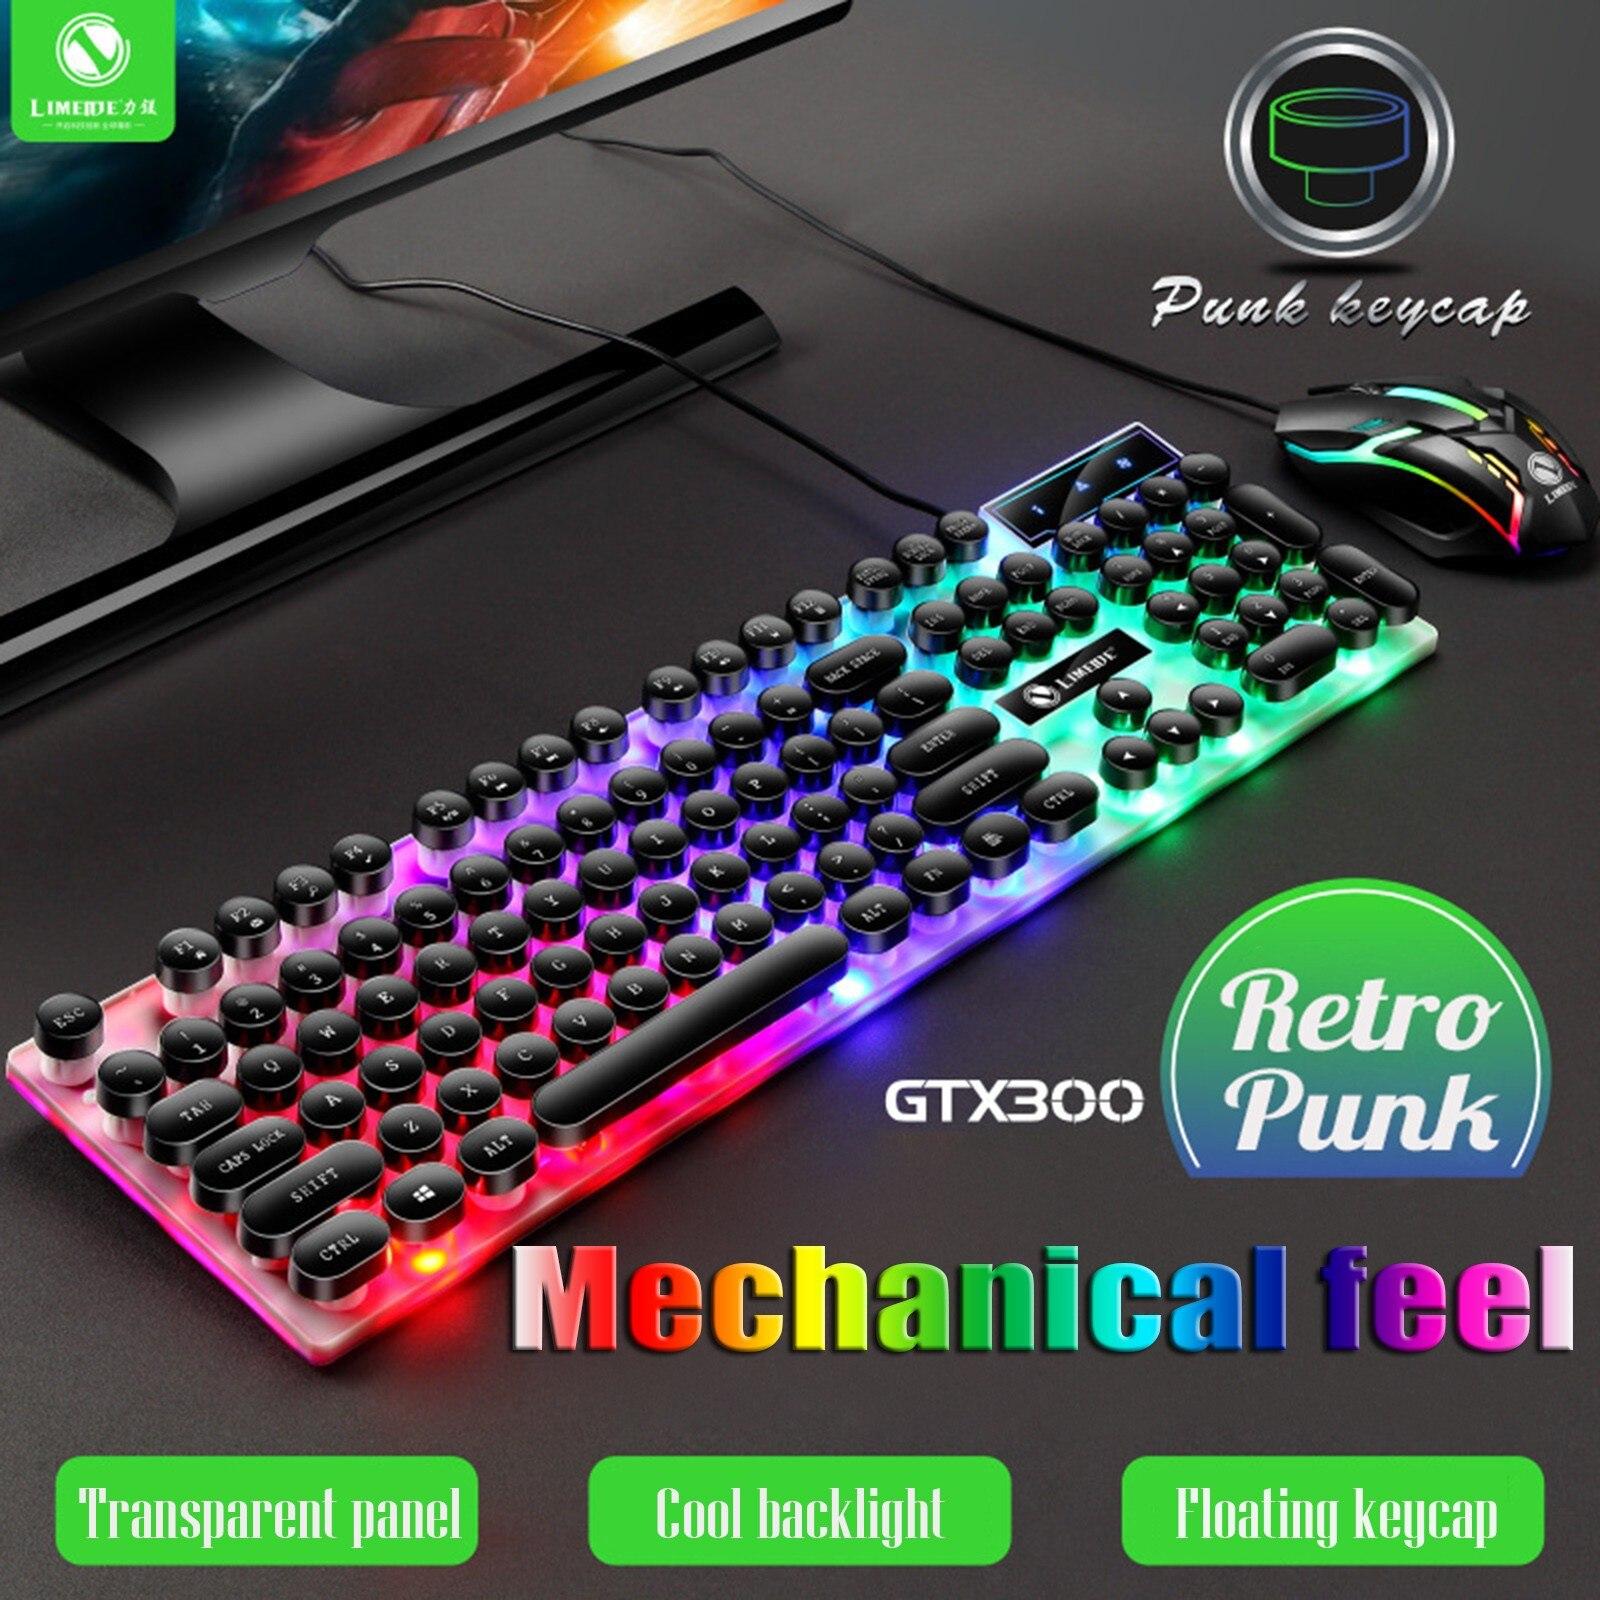 Gtx300 لوحة مفاتيح وماوس مجموعة فاسق الرجعية لوحة المفاتيح الخلفية لعبة Usb السلكية تعليق لوحة مفاتيح وماوس مجموعة #3